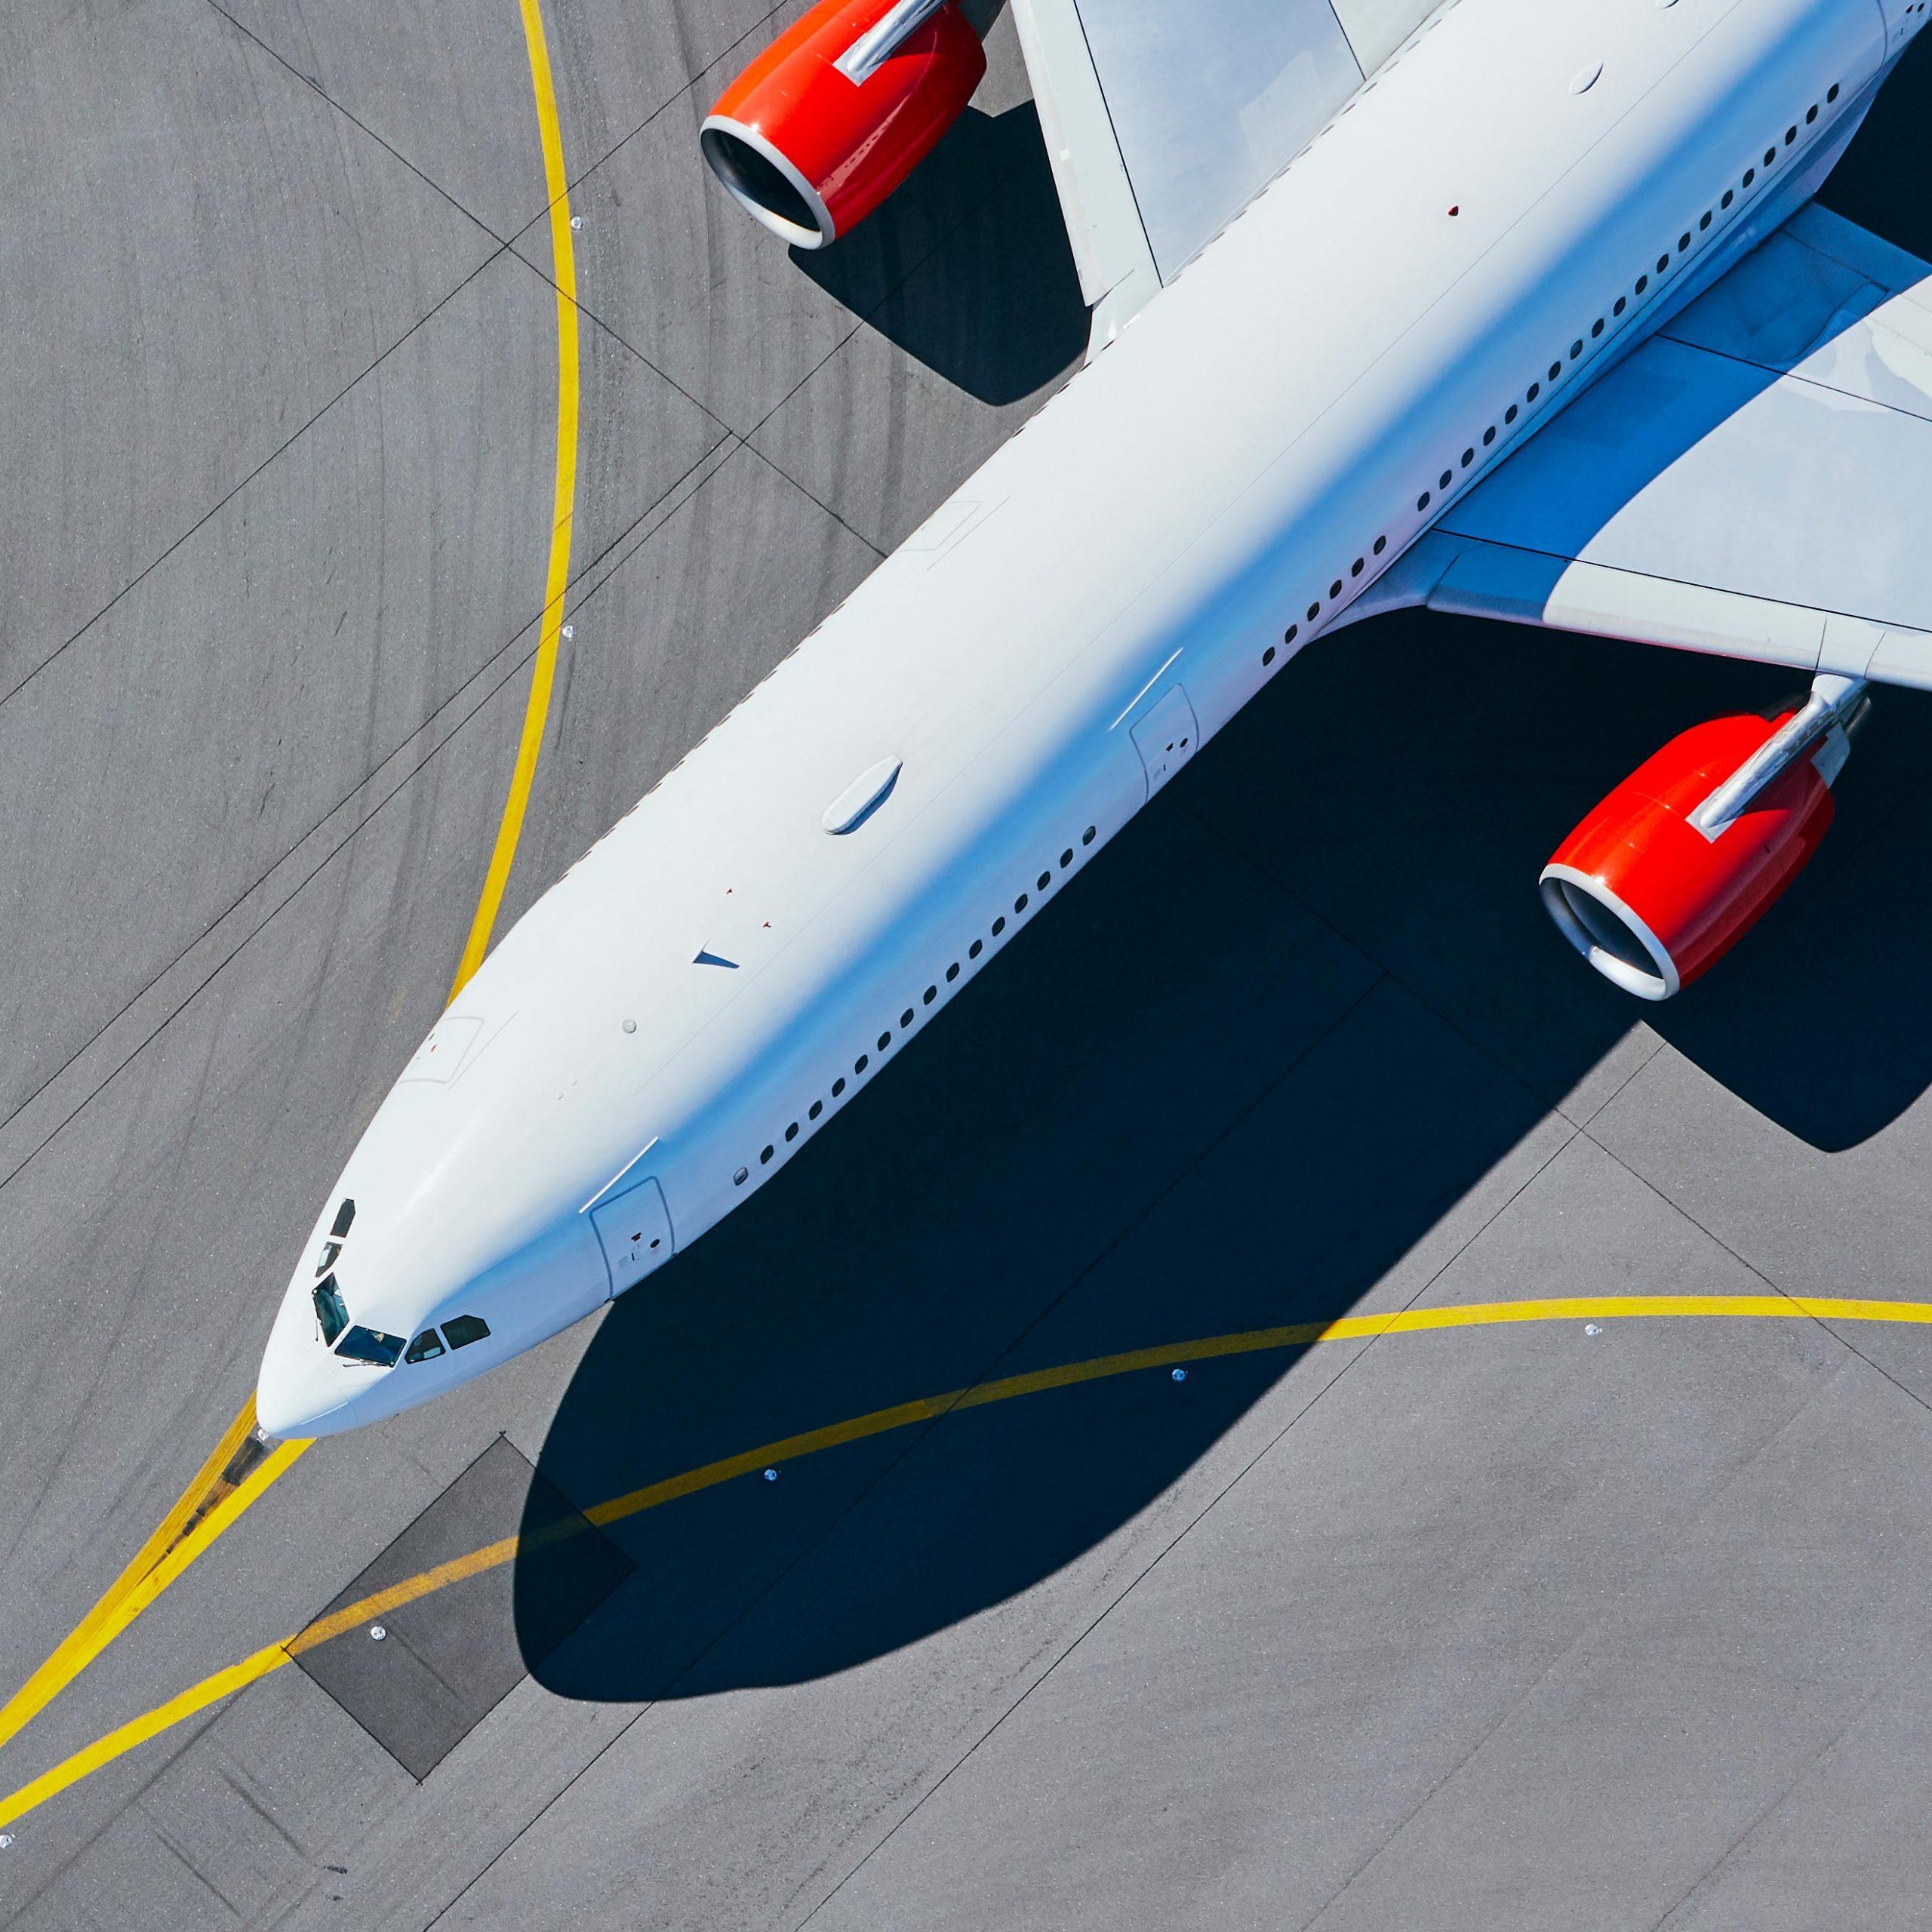 airplane overhead view